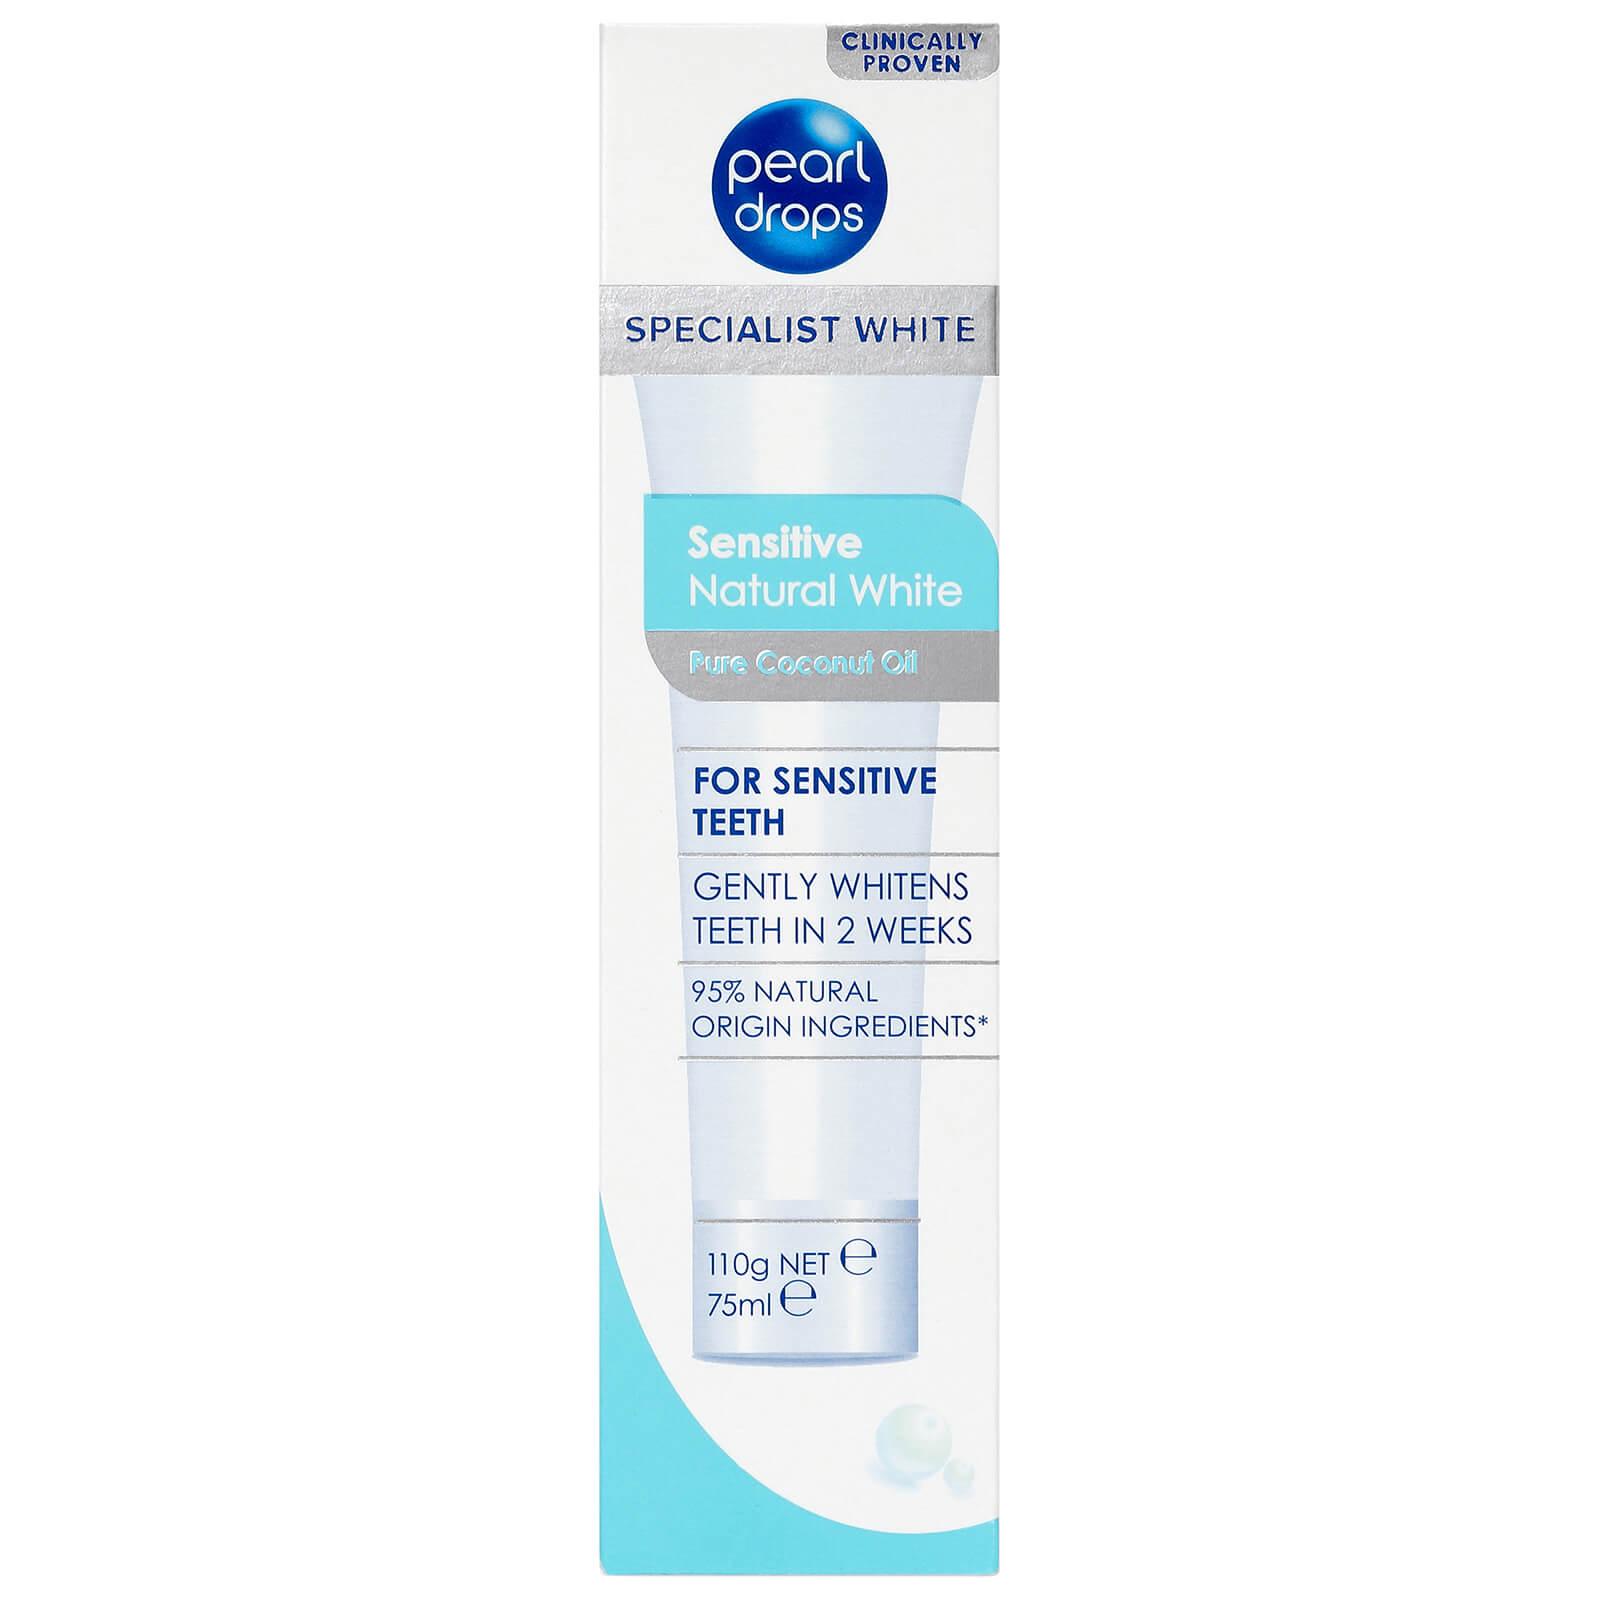 Купить Pearl Drops Sensitive Natural White Toothpaste 75ml